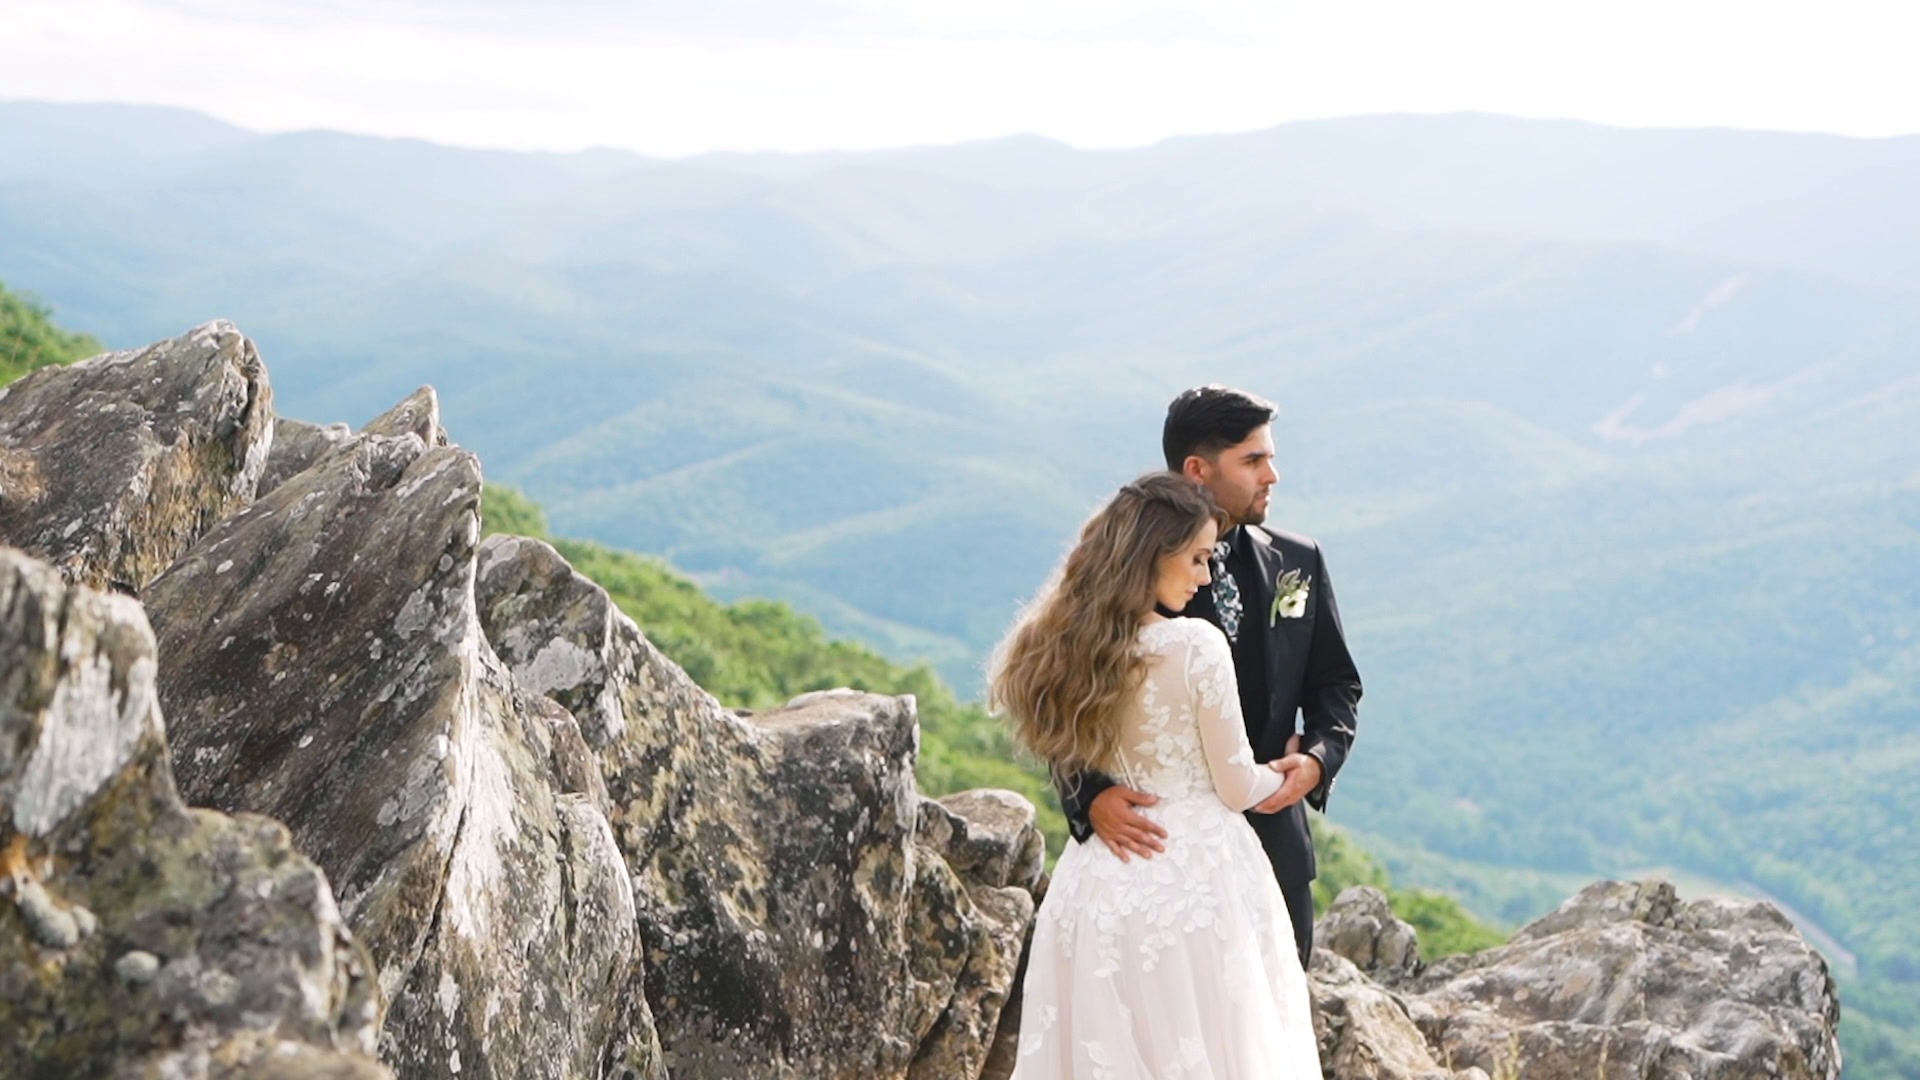 Courtney + Rafael | Virginia, Virginia | Ravens Roost